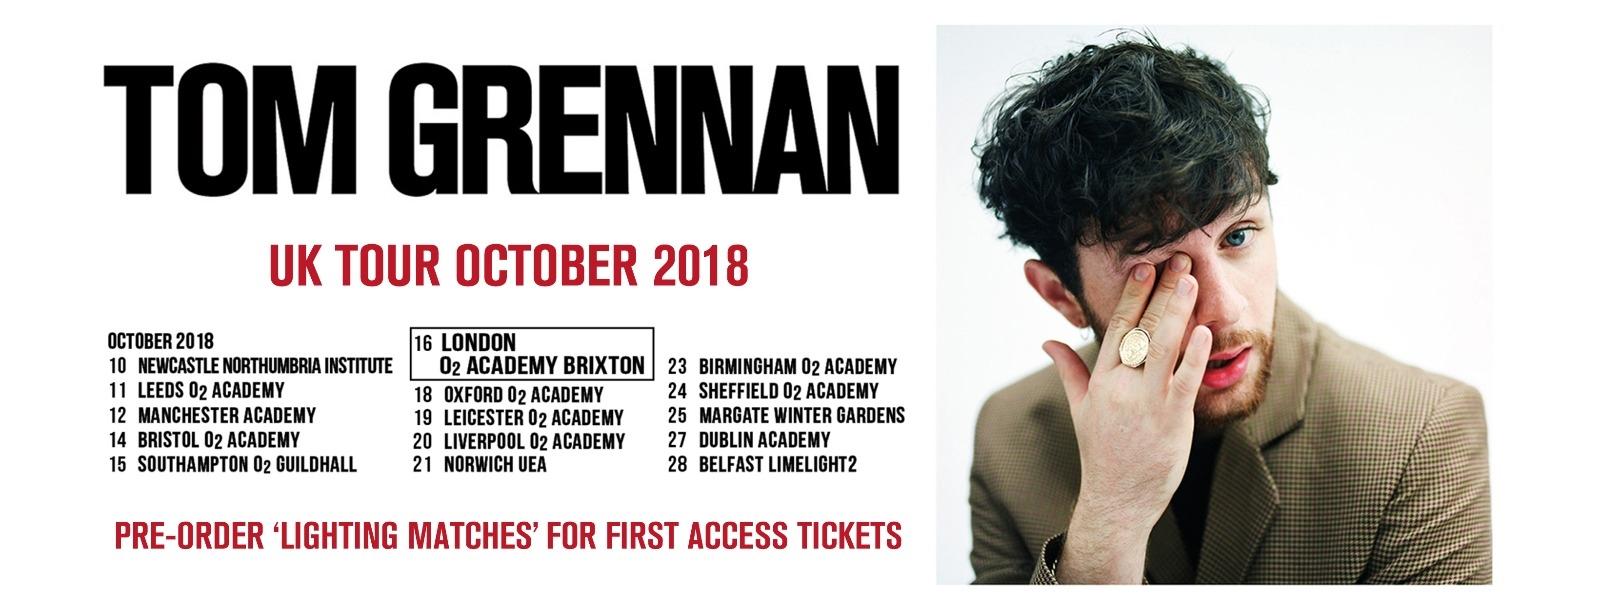 Tom Grennan announces October 2018 Tour!